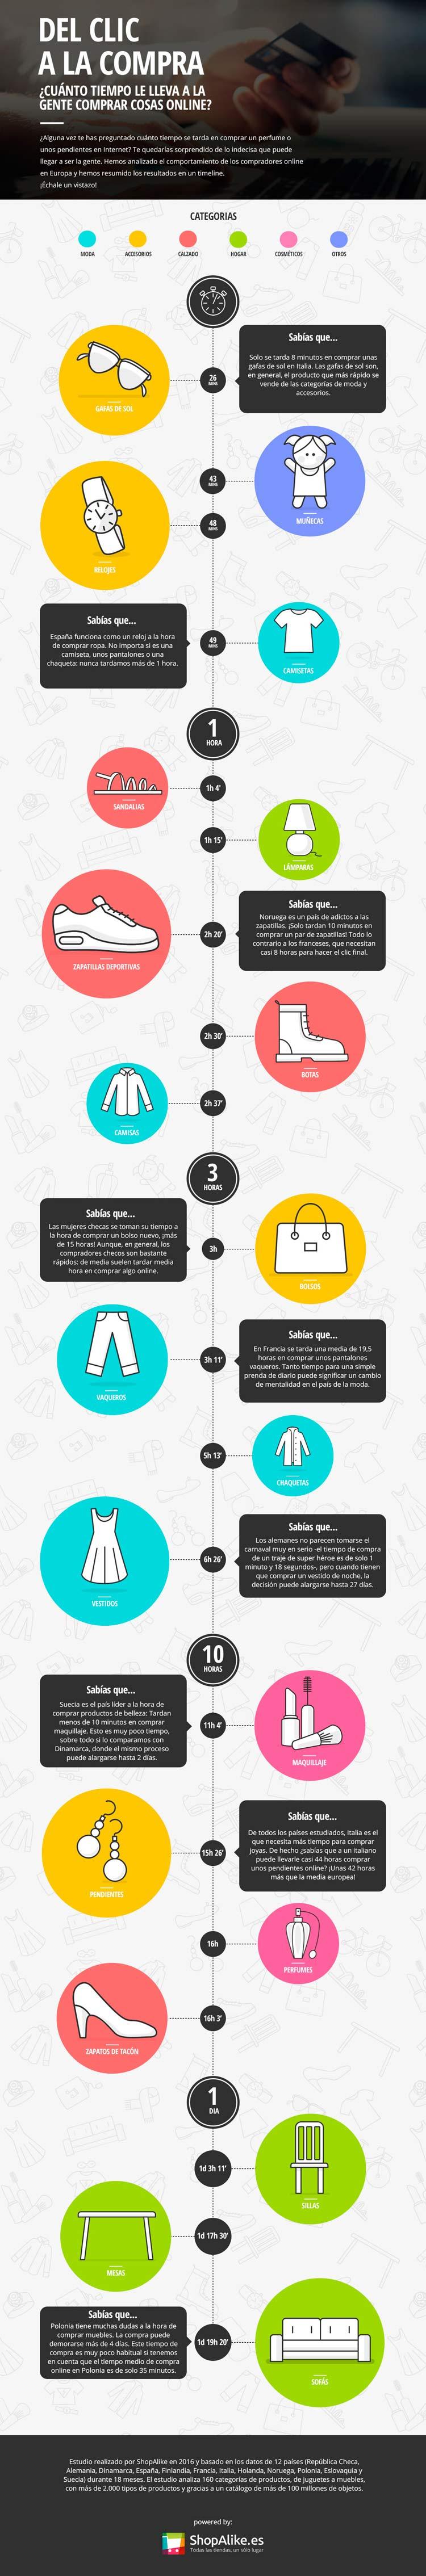 compradordigital infografia